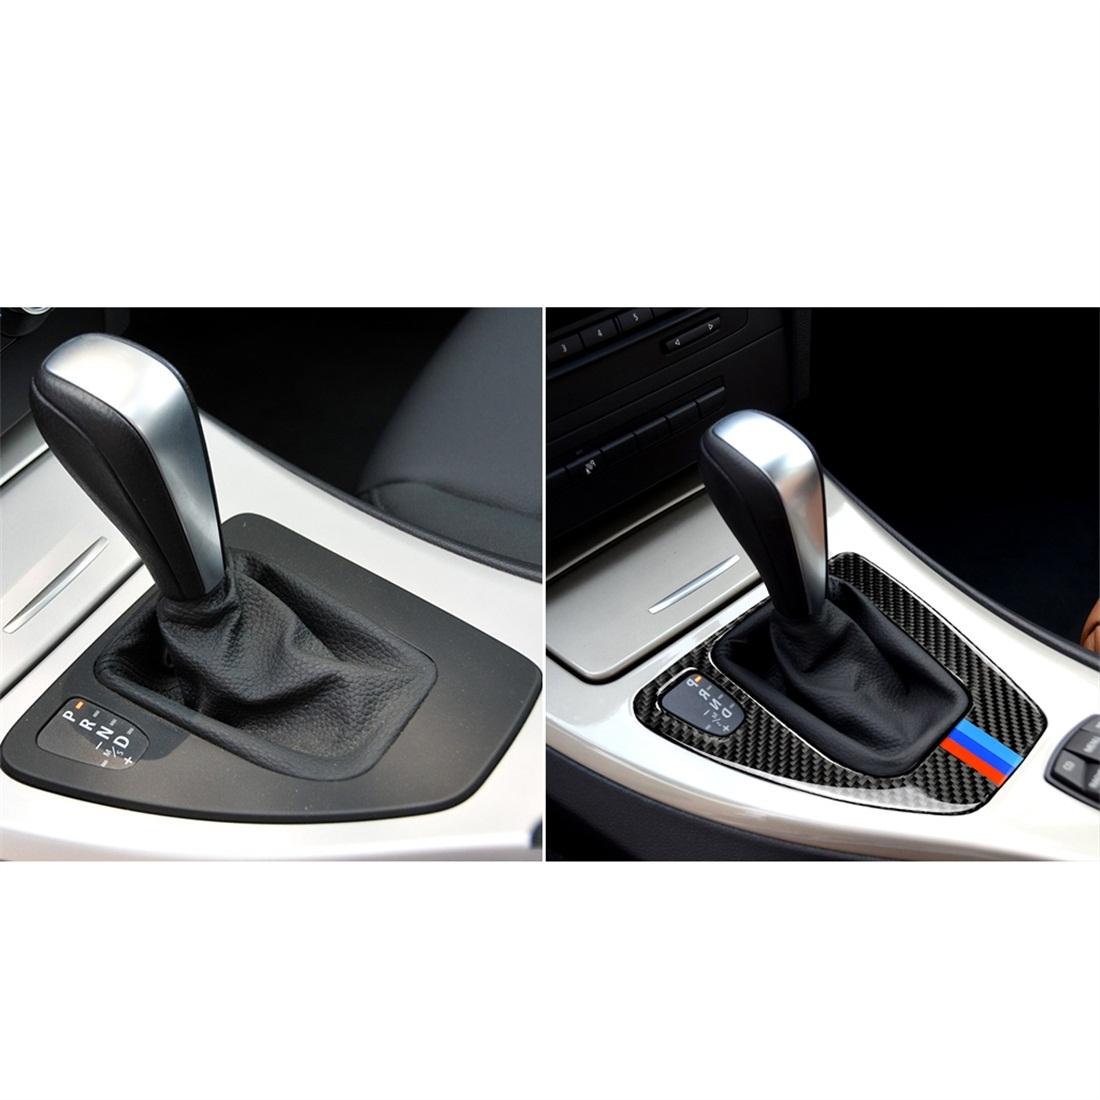 Three Color Carbon Fiber Car Left Driving Gear Panel Decorative Sticker for BMW E90 / E92 2005-2012, Sutible for Left Driving